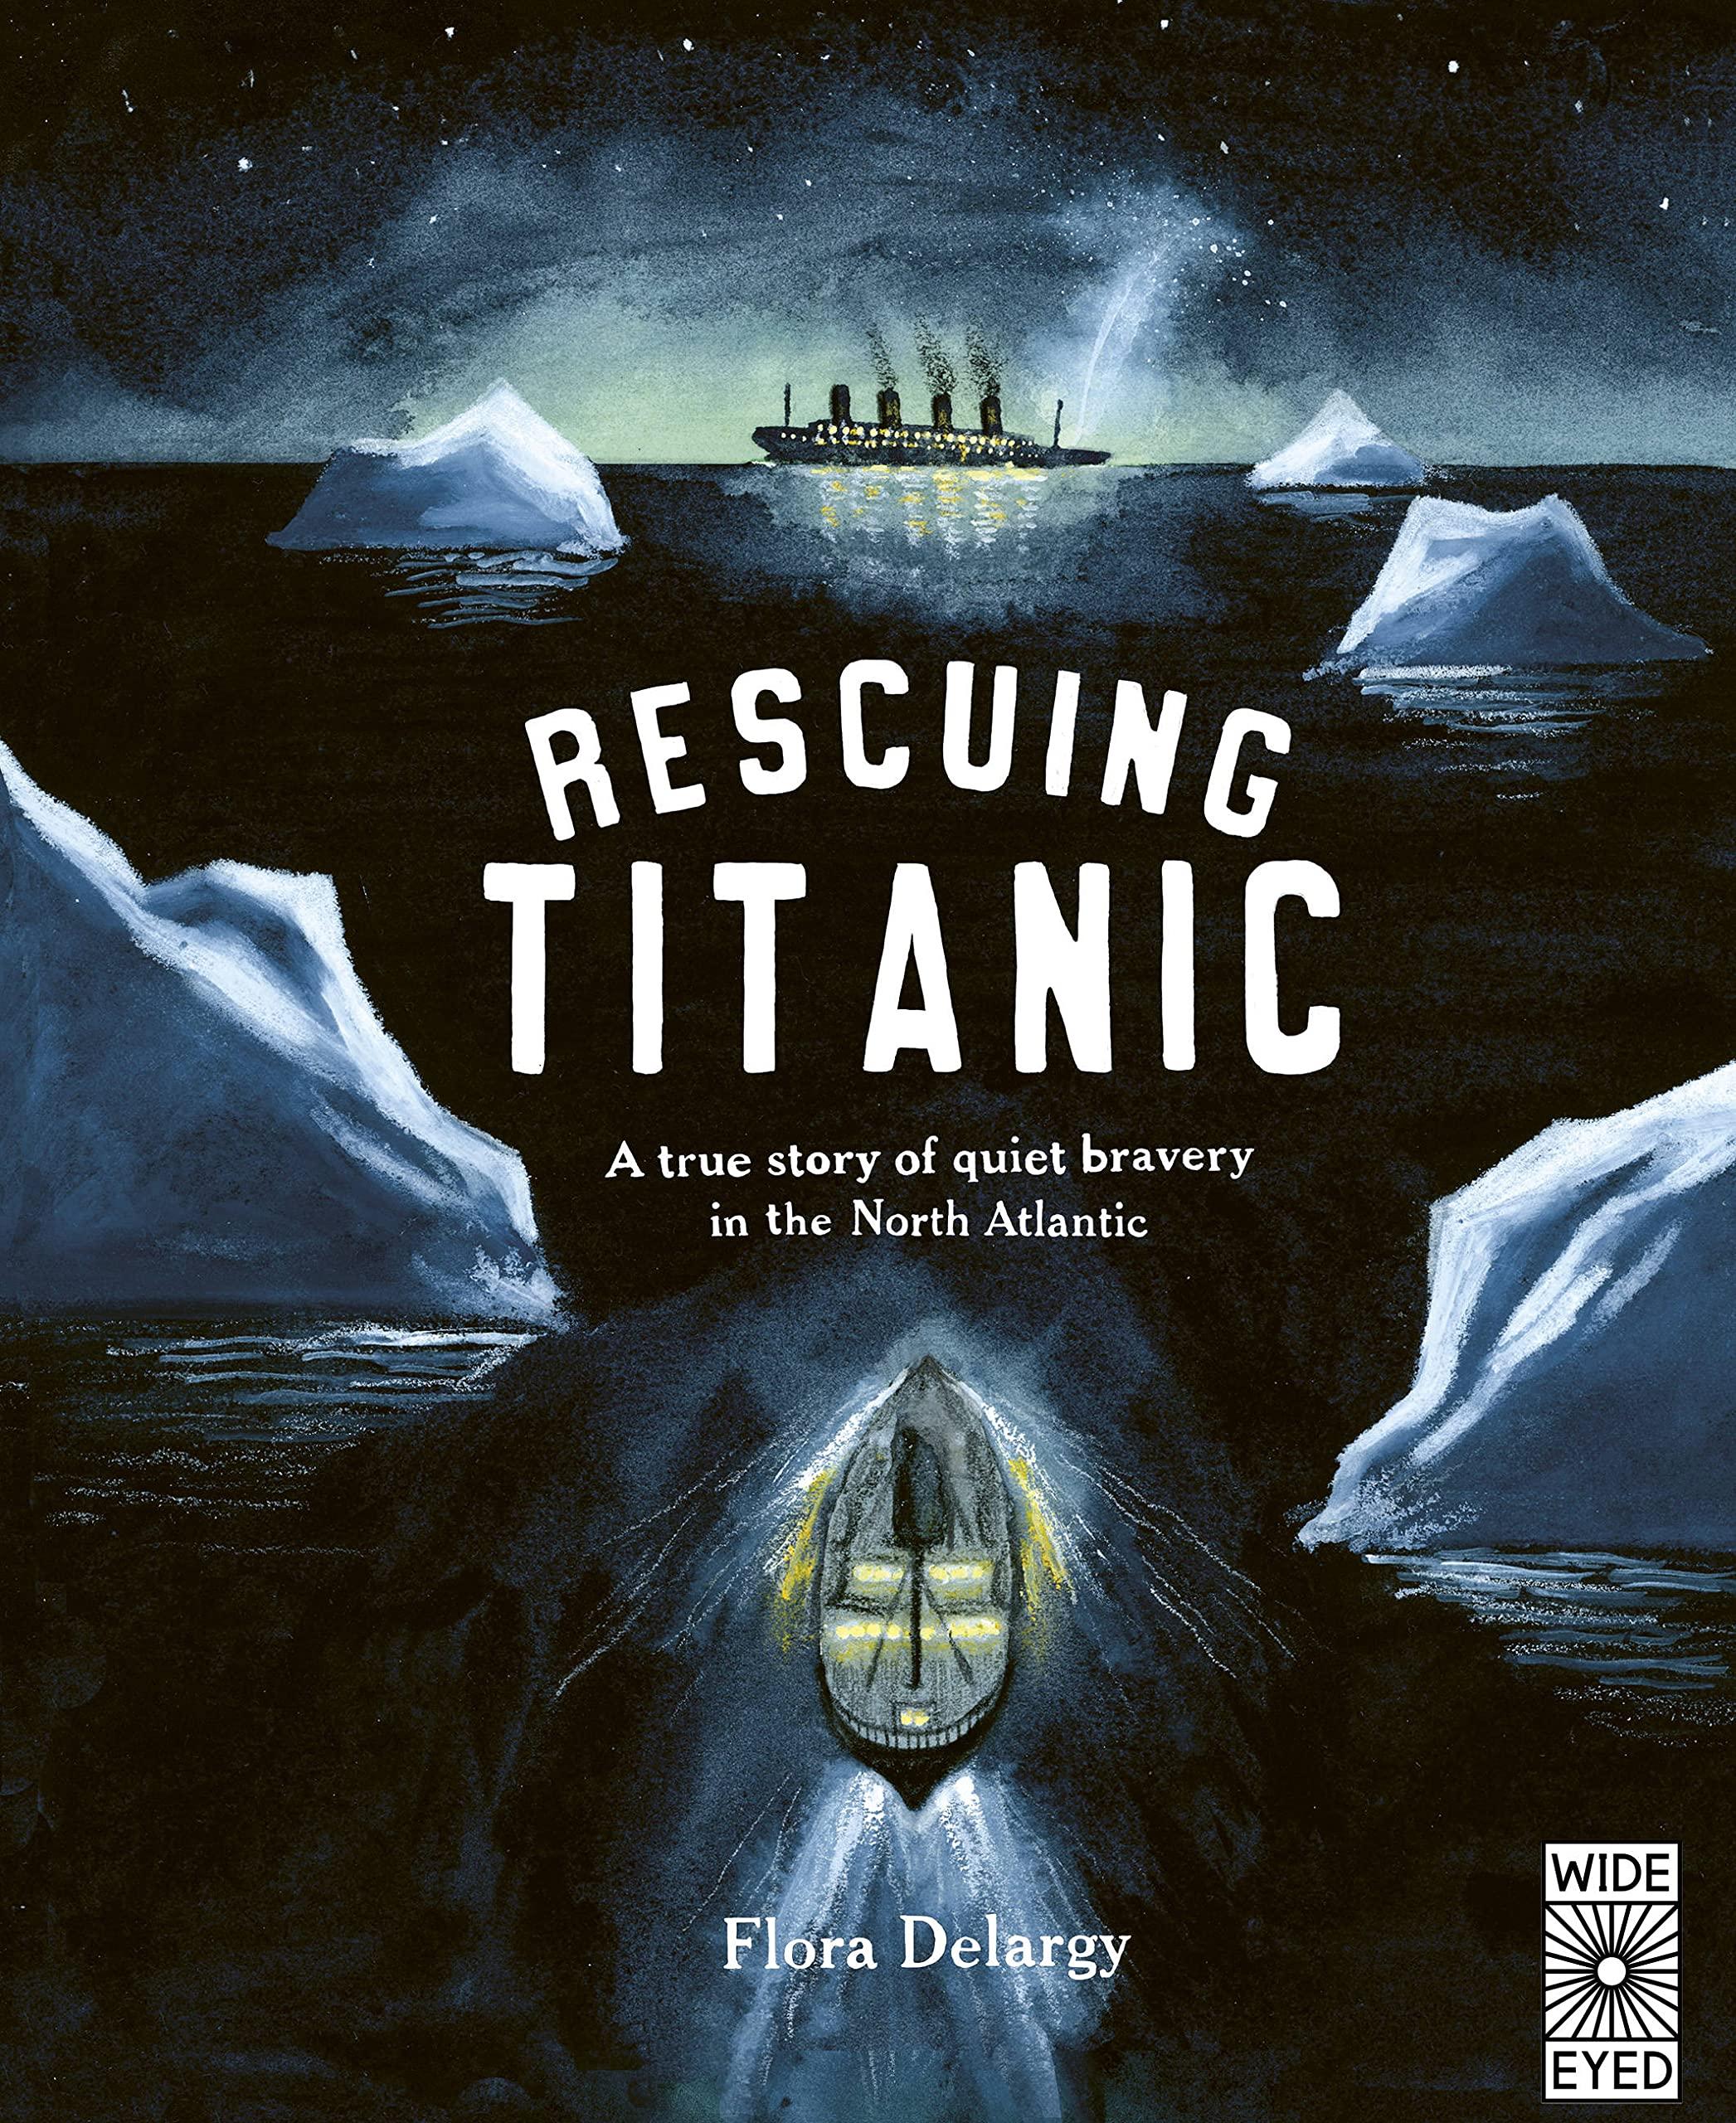 Amazon.com: Rescuing Titanic: A true story of quiet bravery in the North  Atlantic (Hidden Histories): 9780711262782: Delargy, Flora: Books